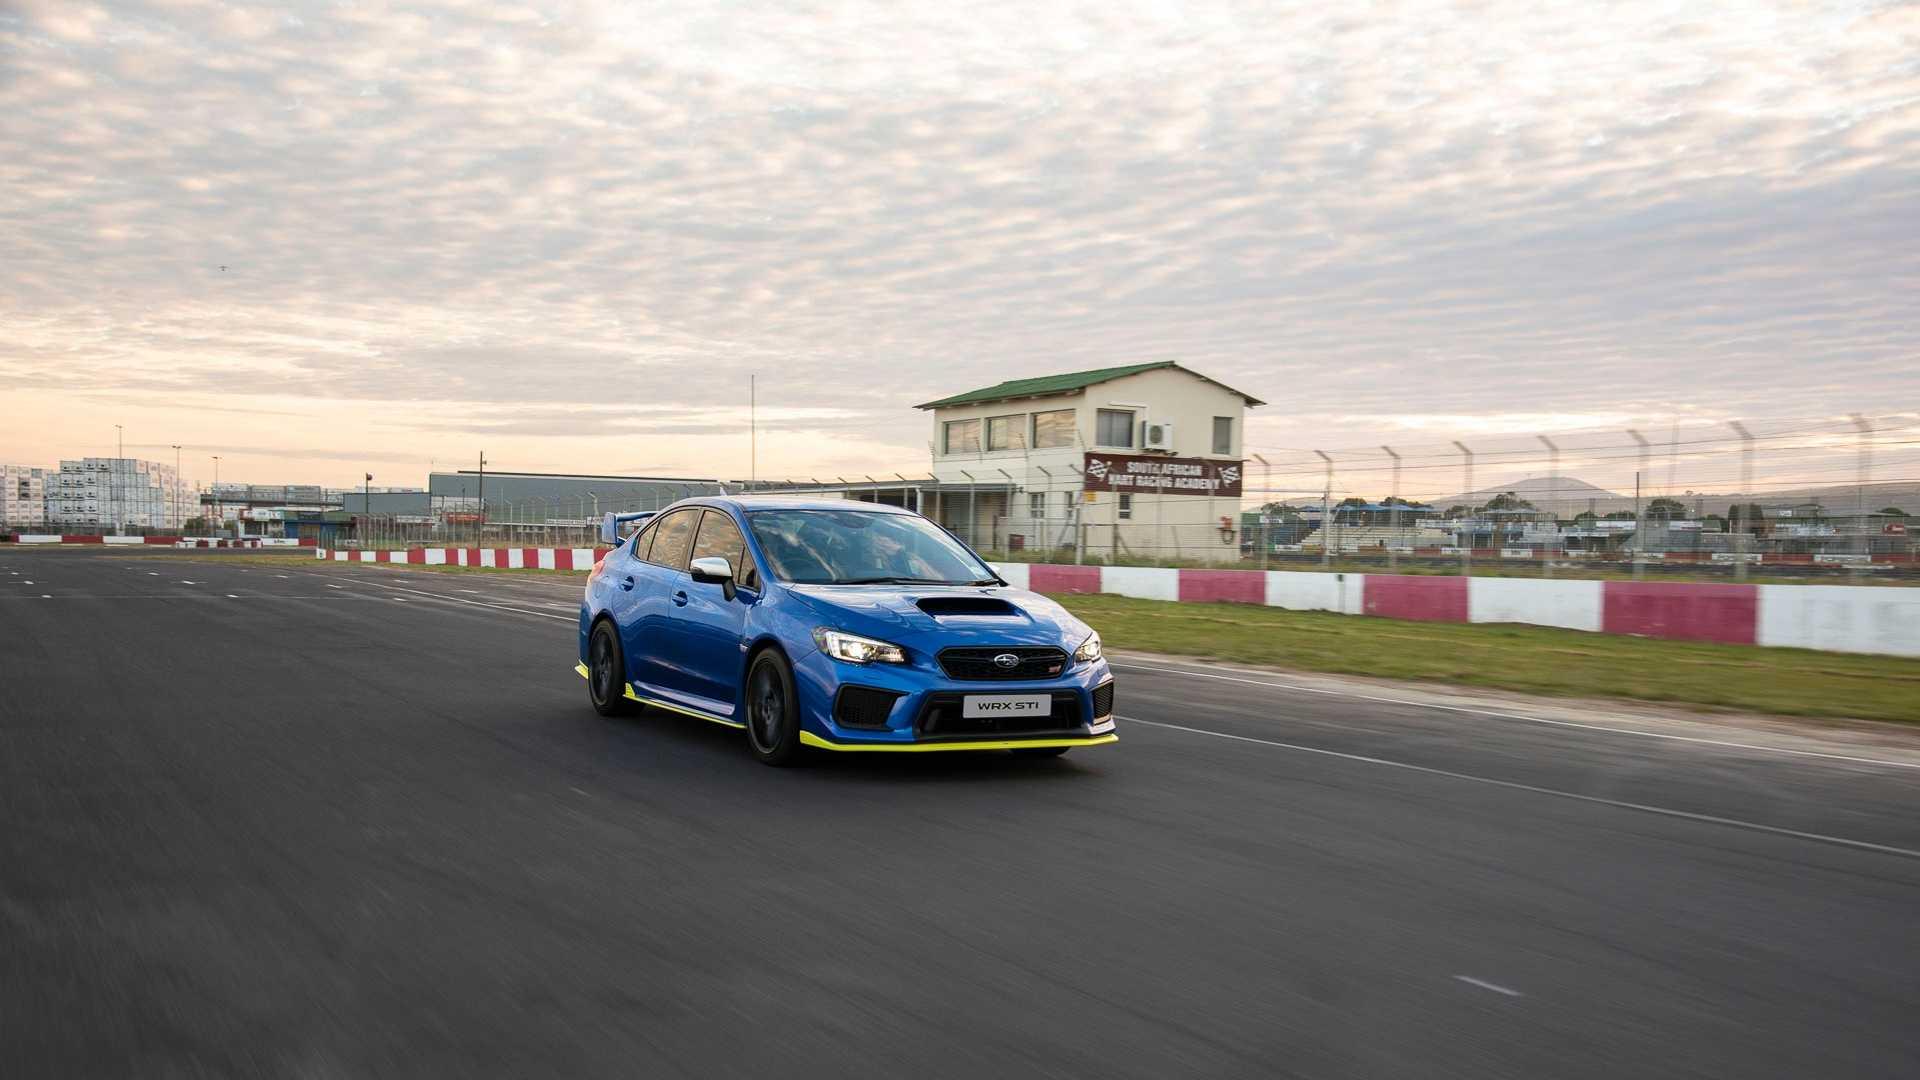 Subaru презентовала самую мощную серийную WRX STI 2